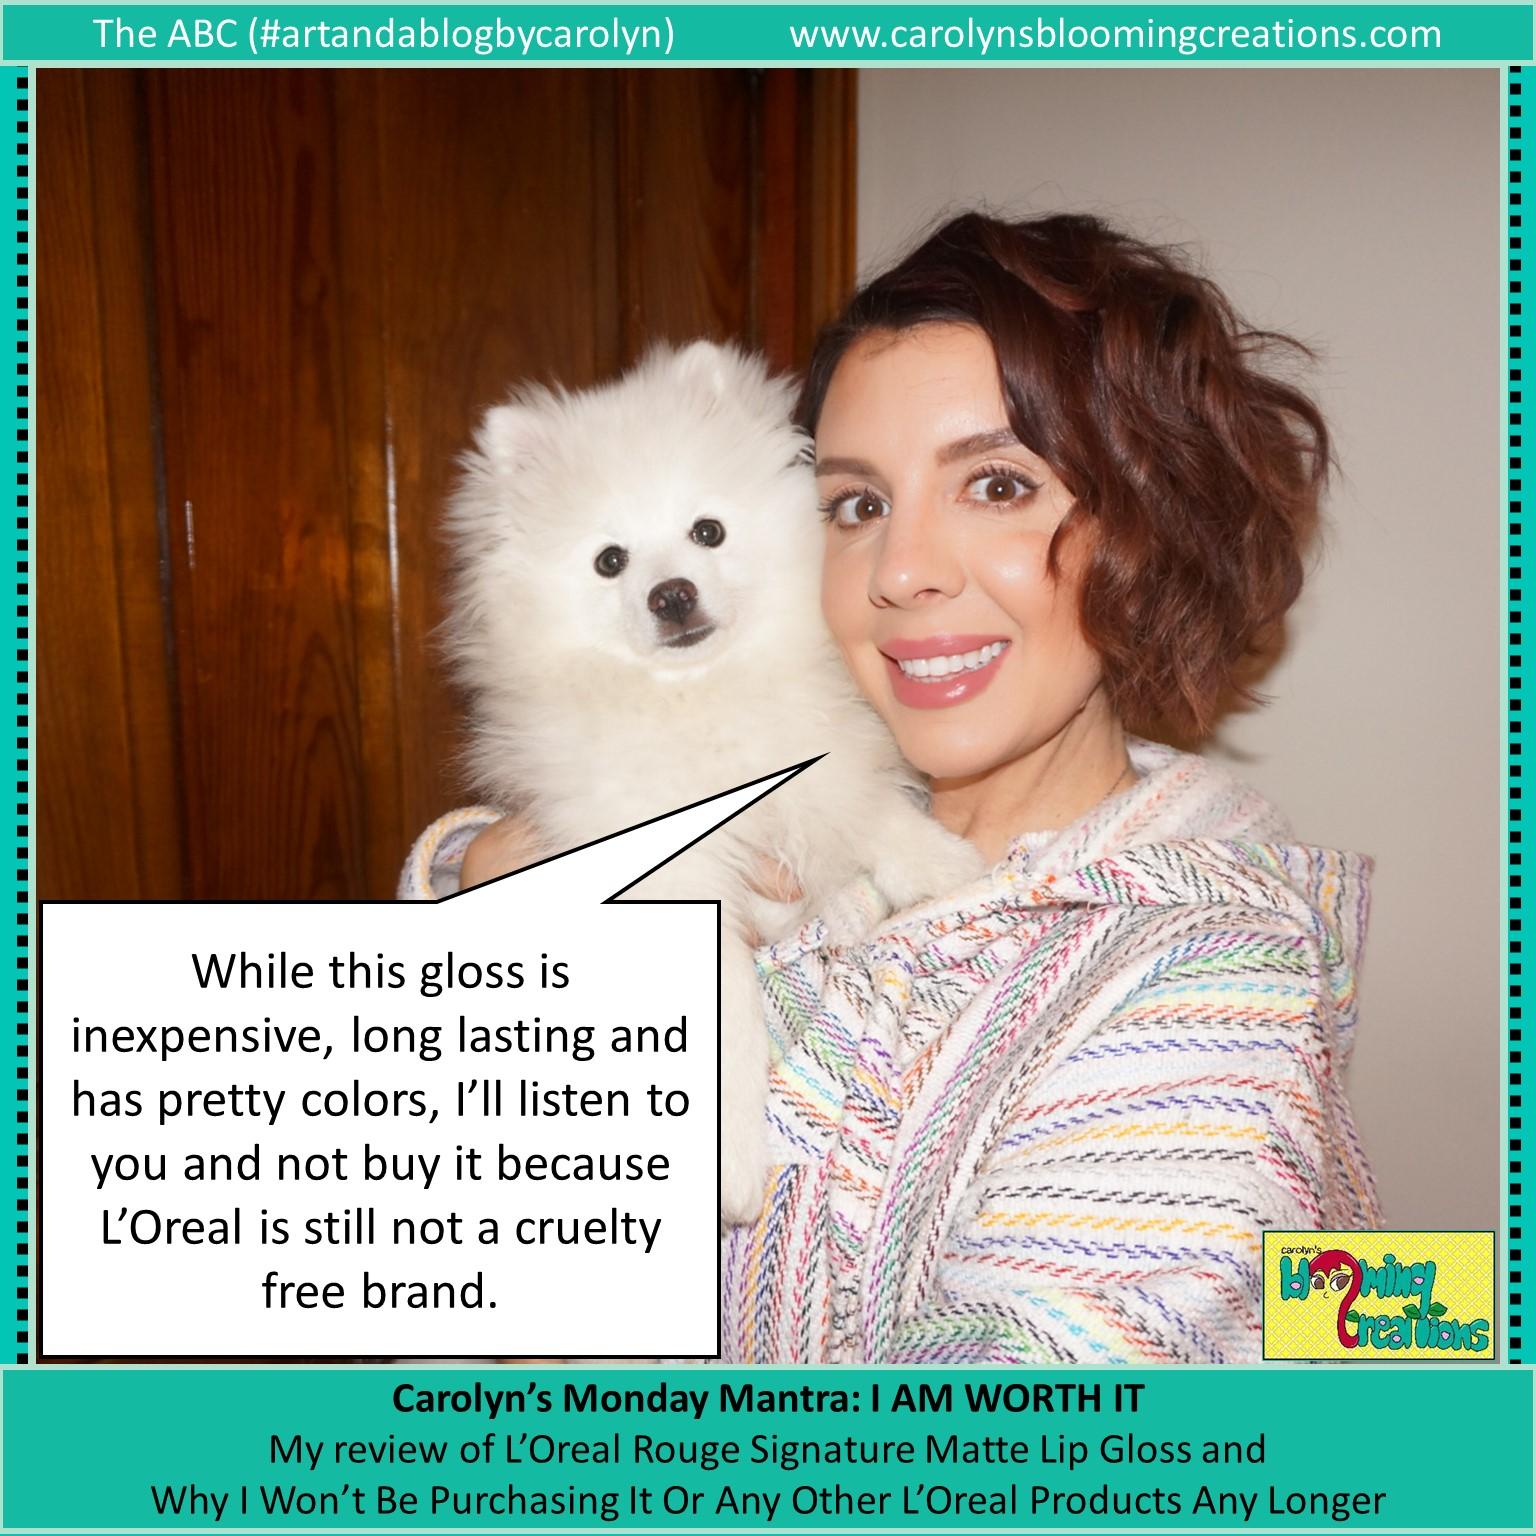 Photography by Carolyn J. Braden  Pin me! www.carolynsbloomingcreations.com